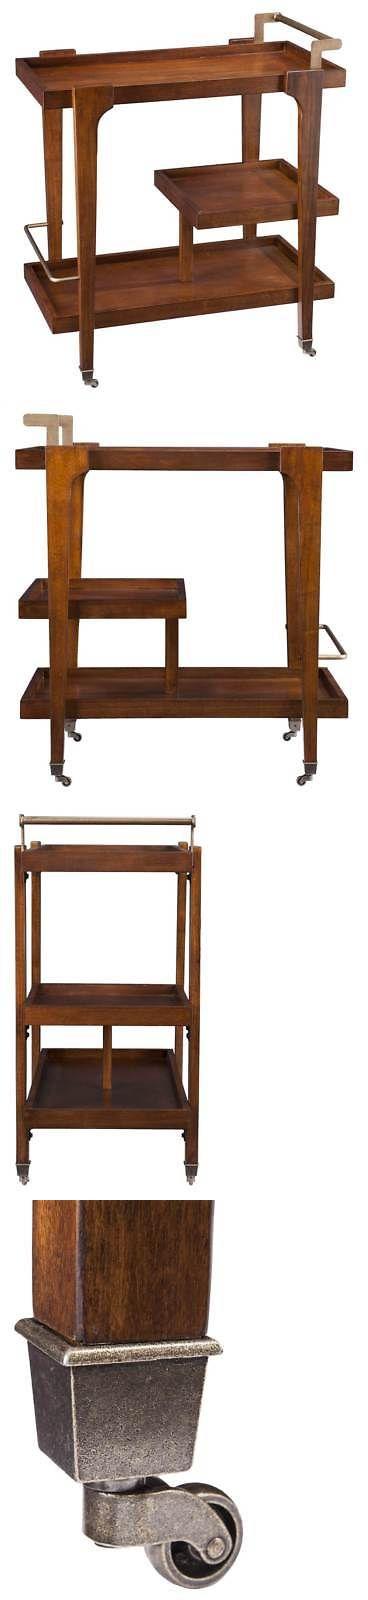 Kitchen Islands Kitchen Carts 115753: Midcentury Modern Bar Cart [Id 3543396] -> BUY IT NOW ONLY: $187.23 on eBay!